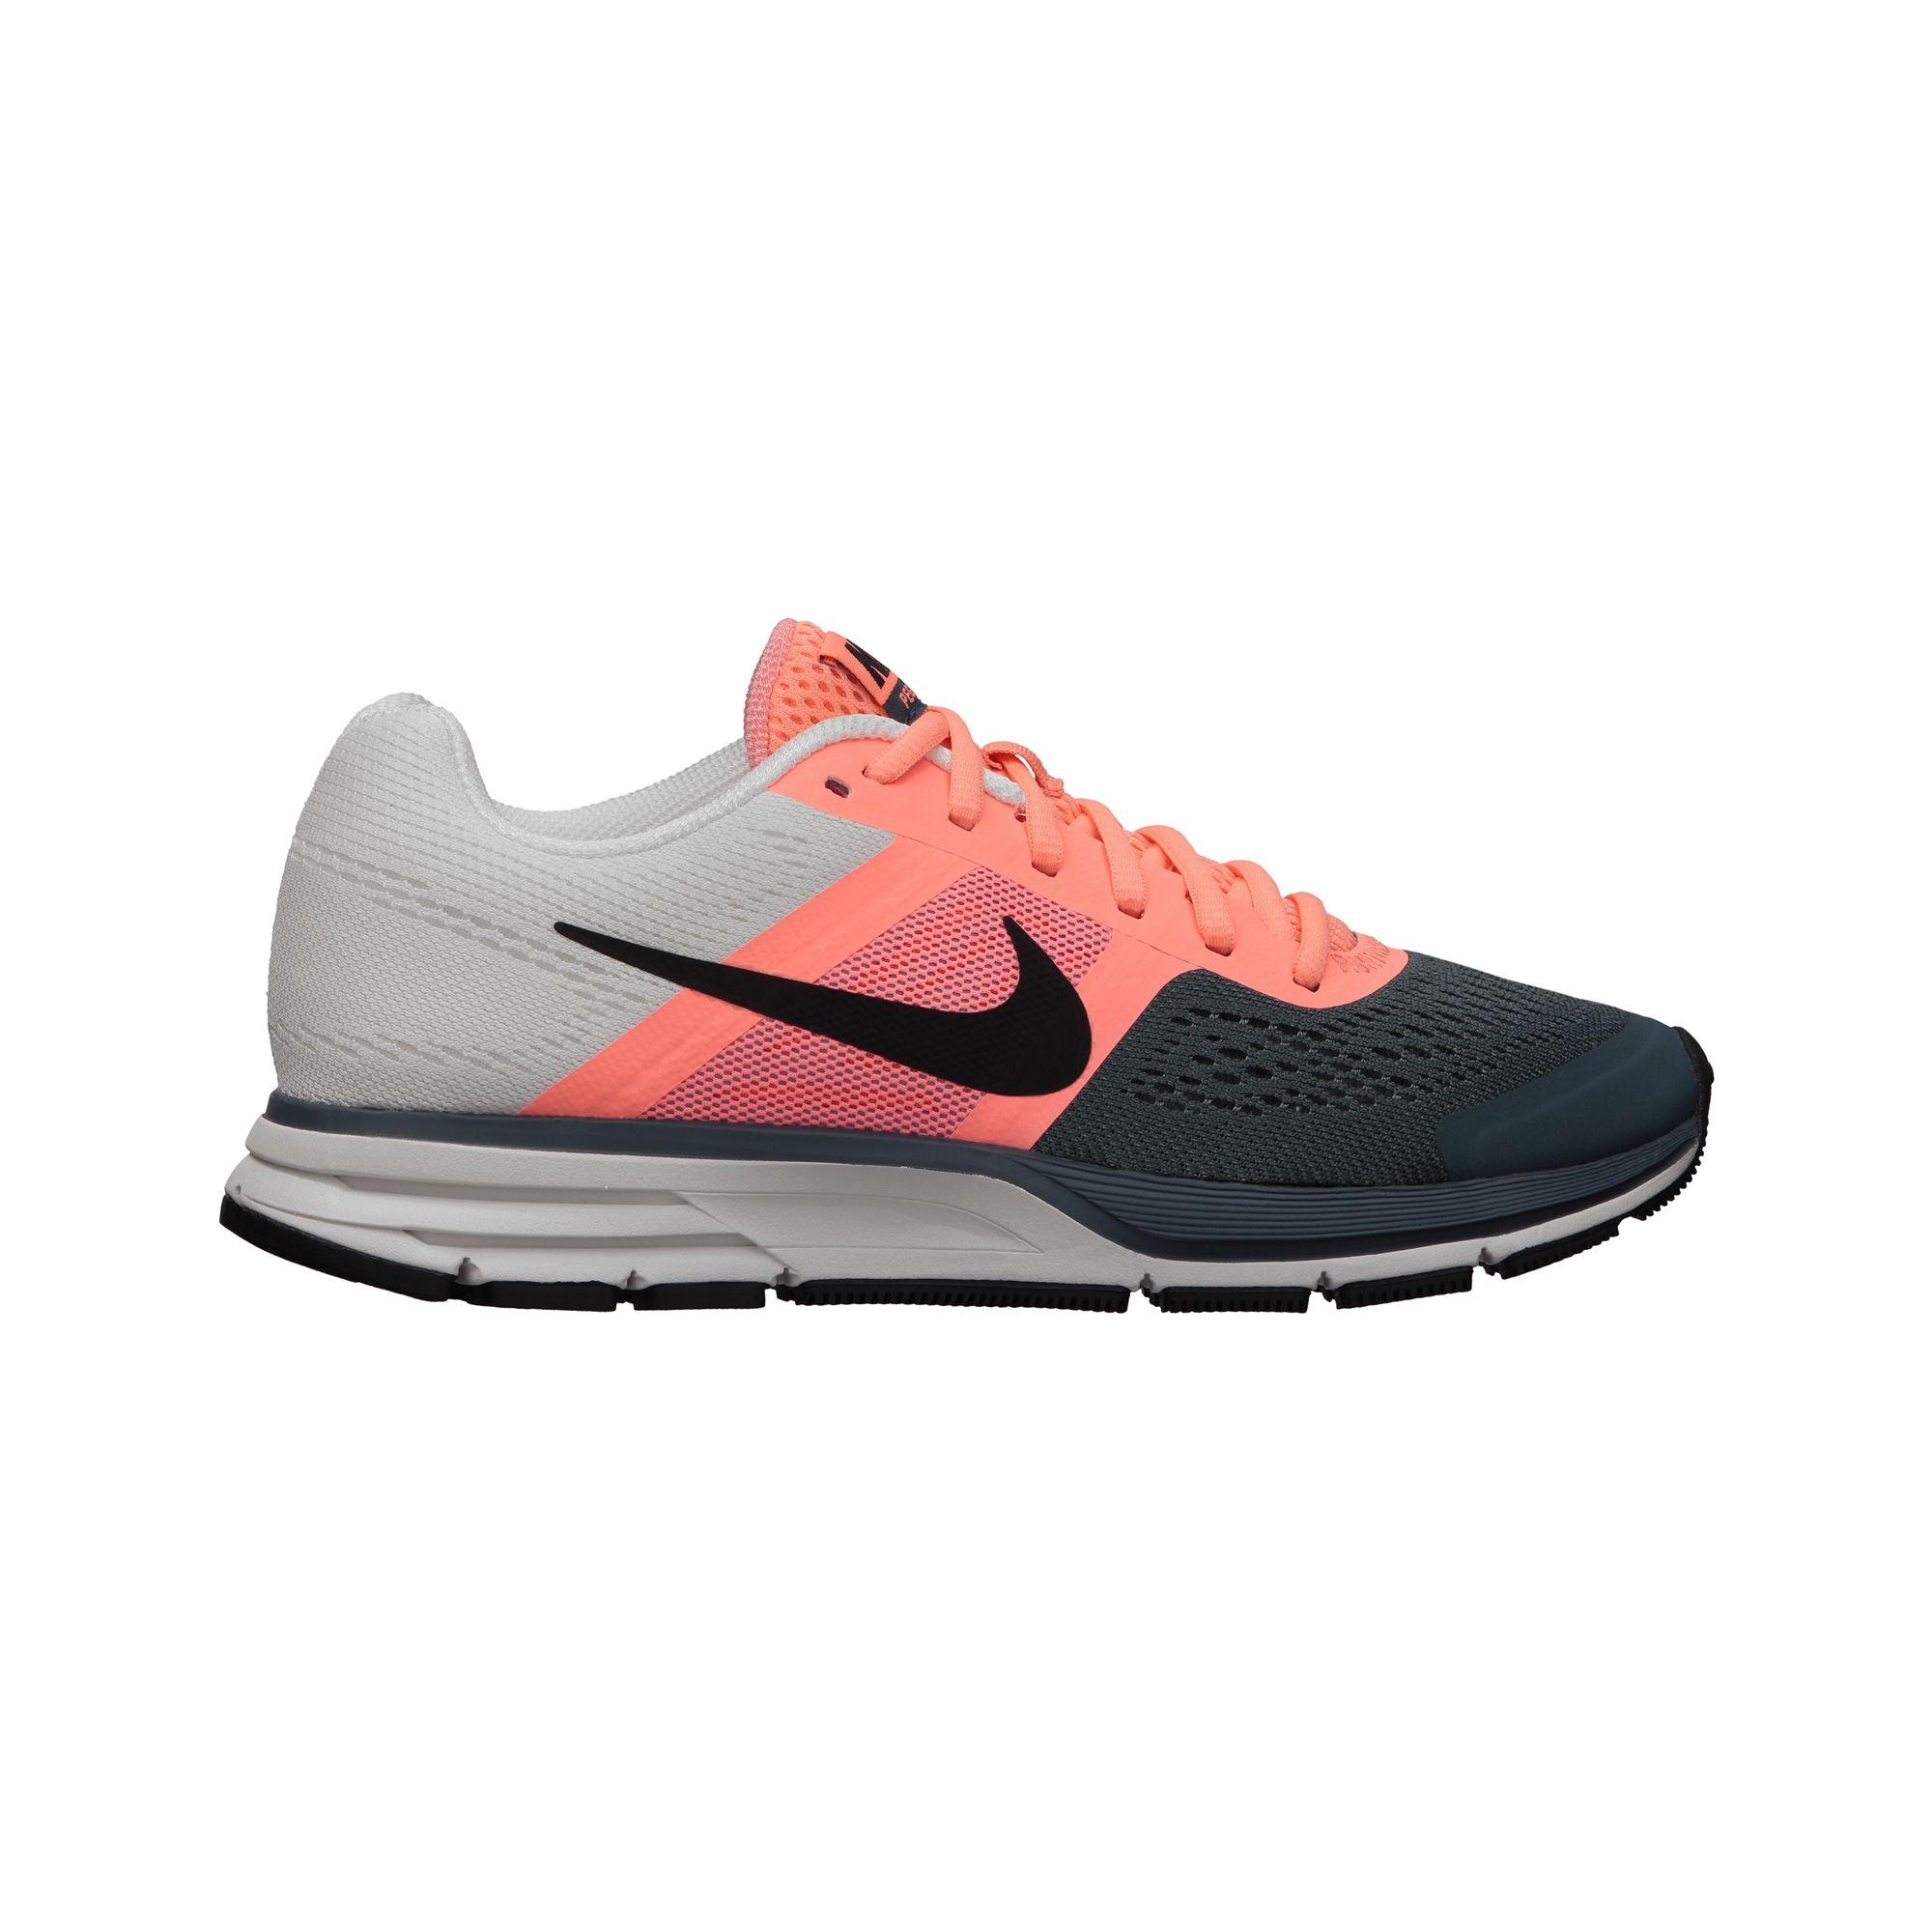 TÊNIS WMNS AIR PEGASUS+ 30 - Todos no Nike.com.br 5cb7bbab55d70